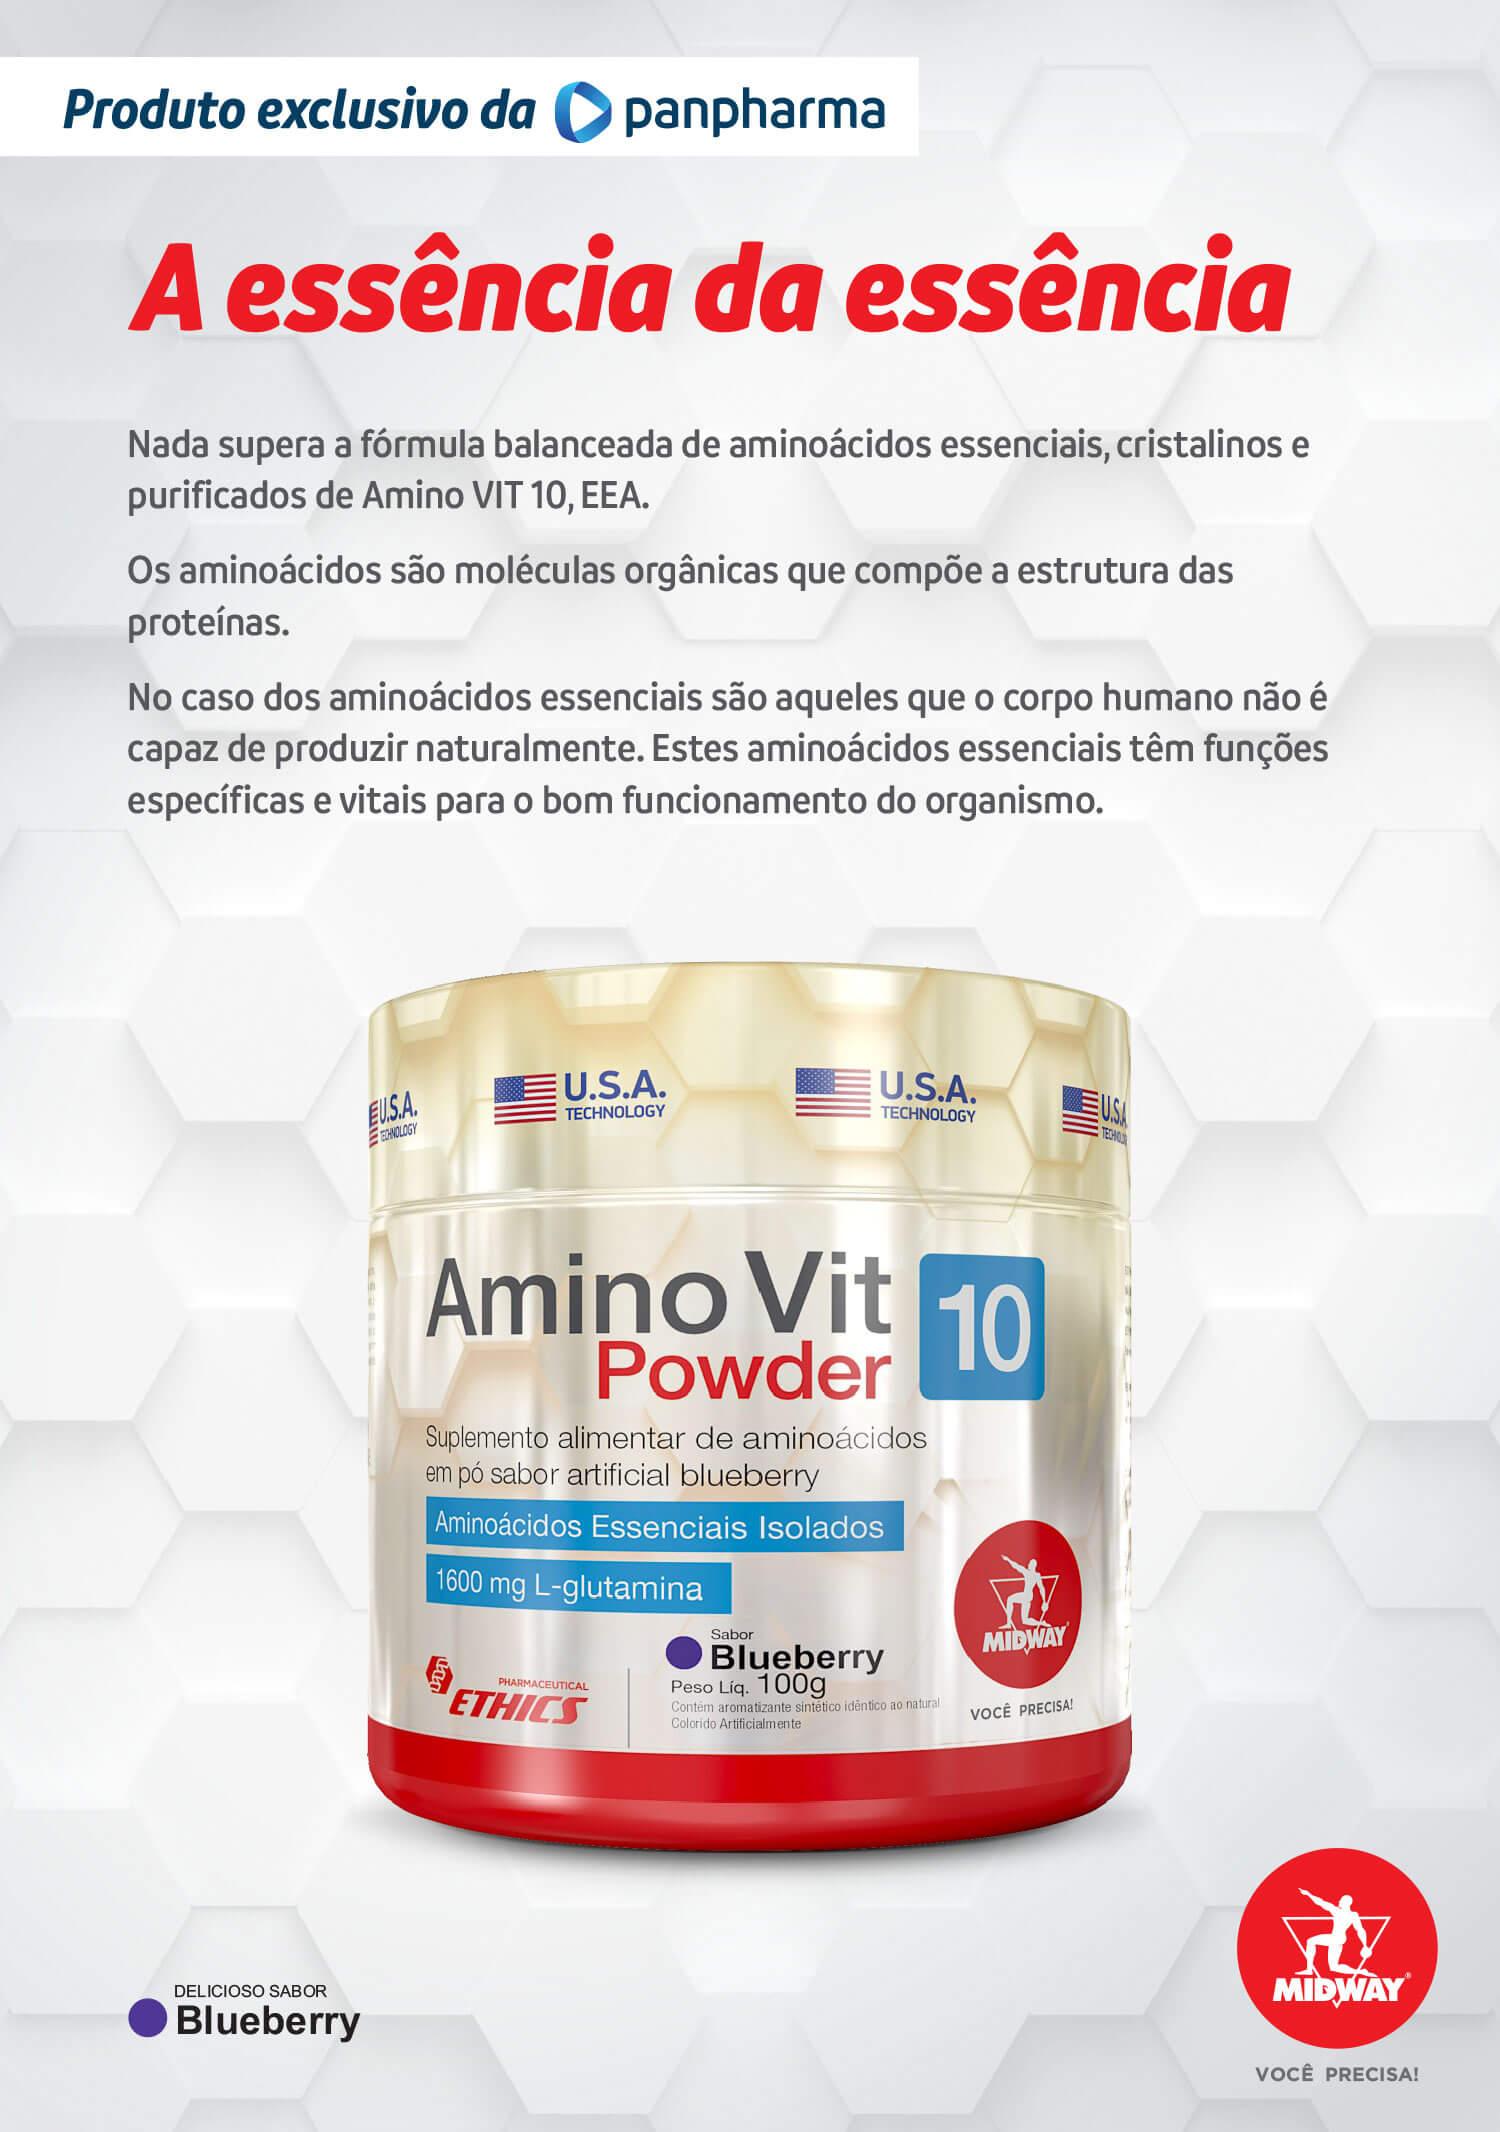 Amino Vit 10 Powder